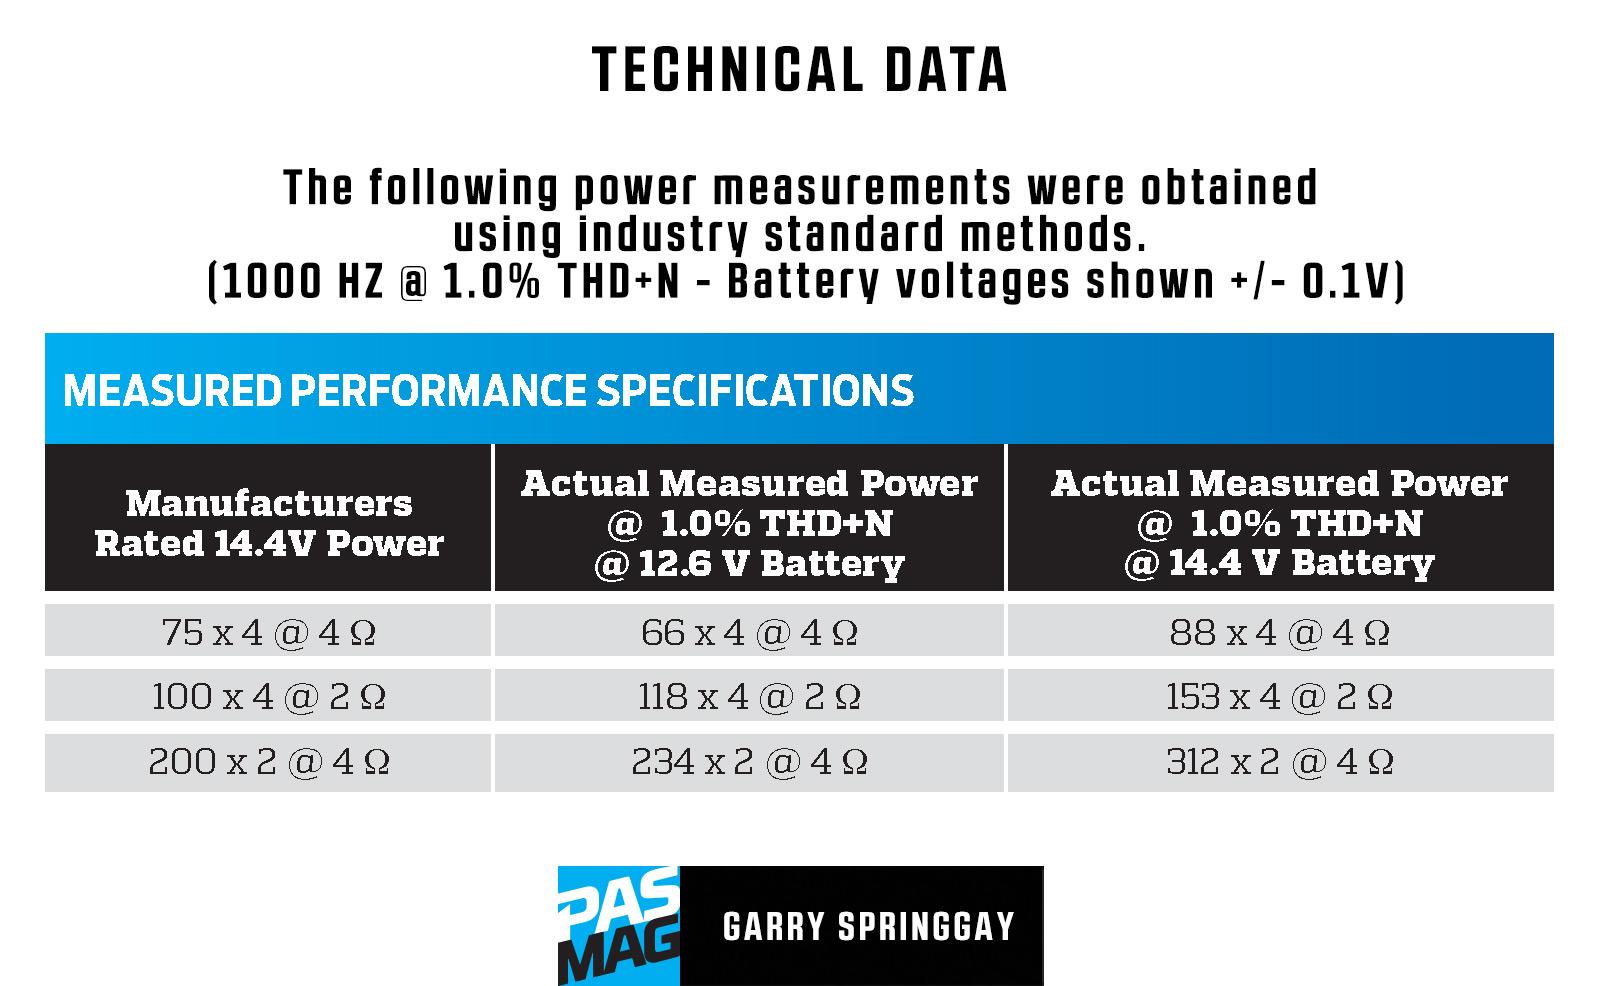 Pasmag performance auto and sound jl audio rd4004 amplifier review jl audio rd400 4 chart tech falaconquin